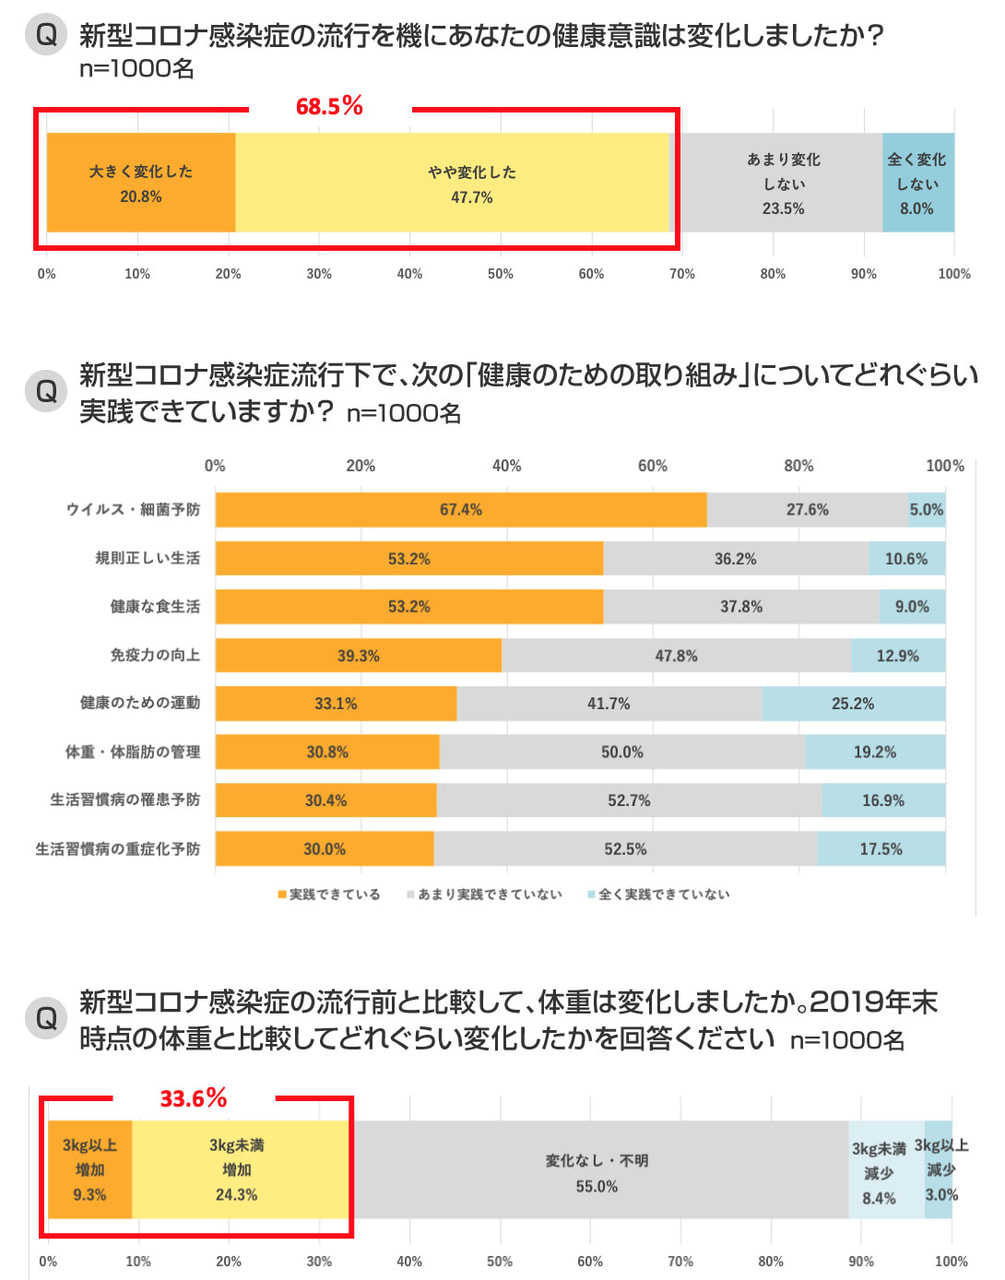 SOMPOひまわり生命2020-06-02 健康応援リサーチ グラフ